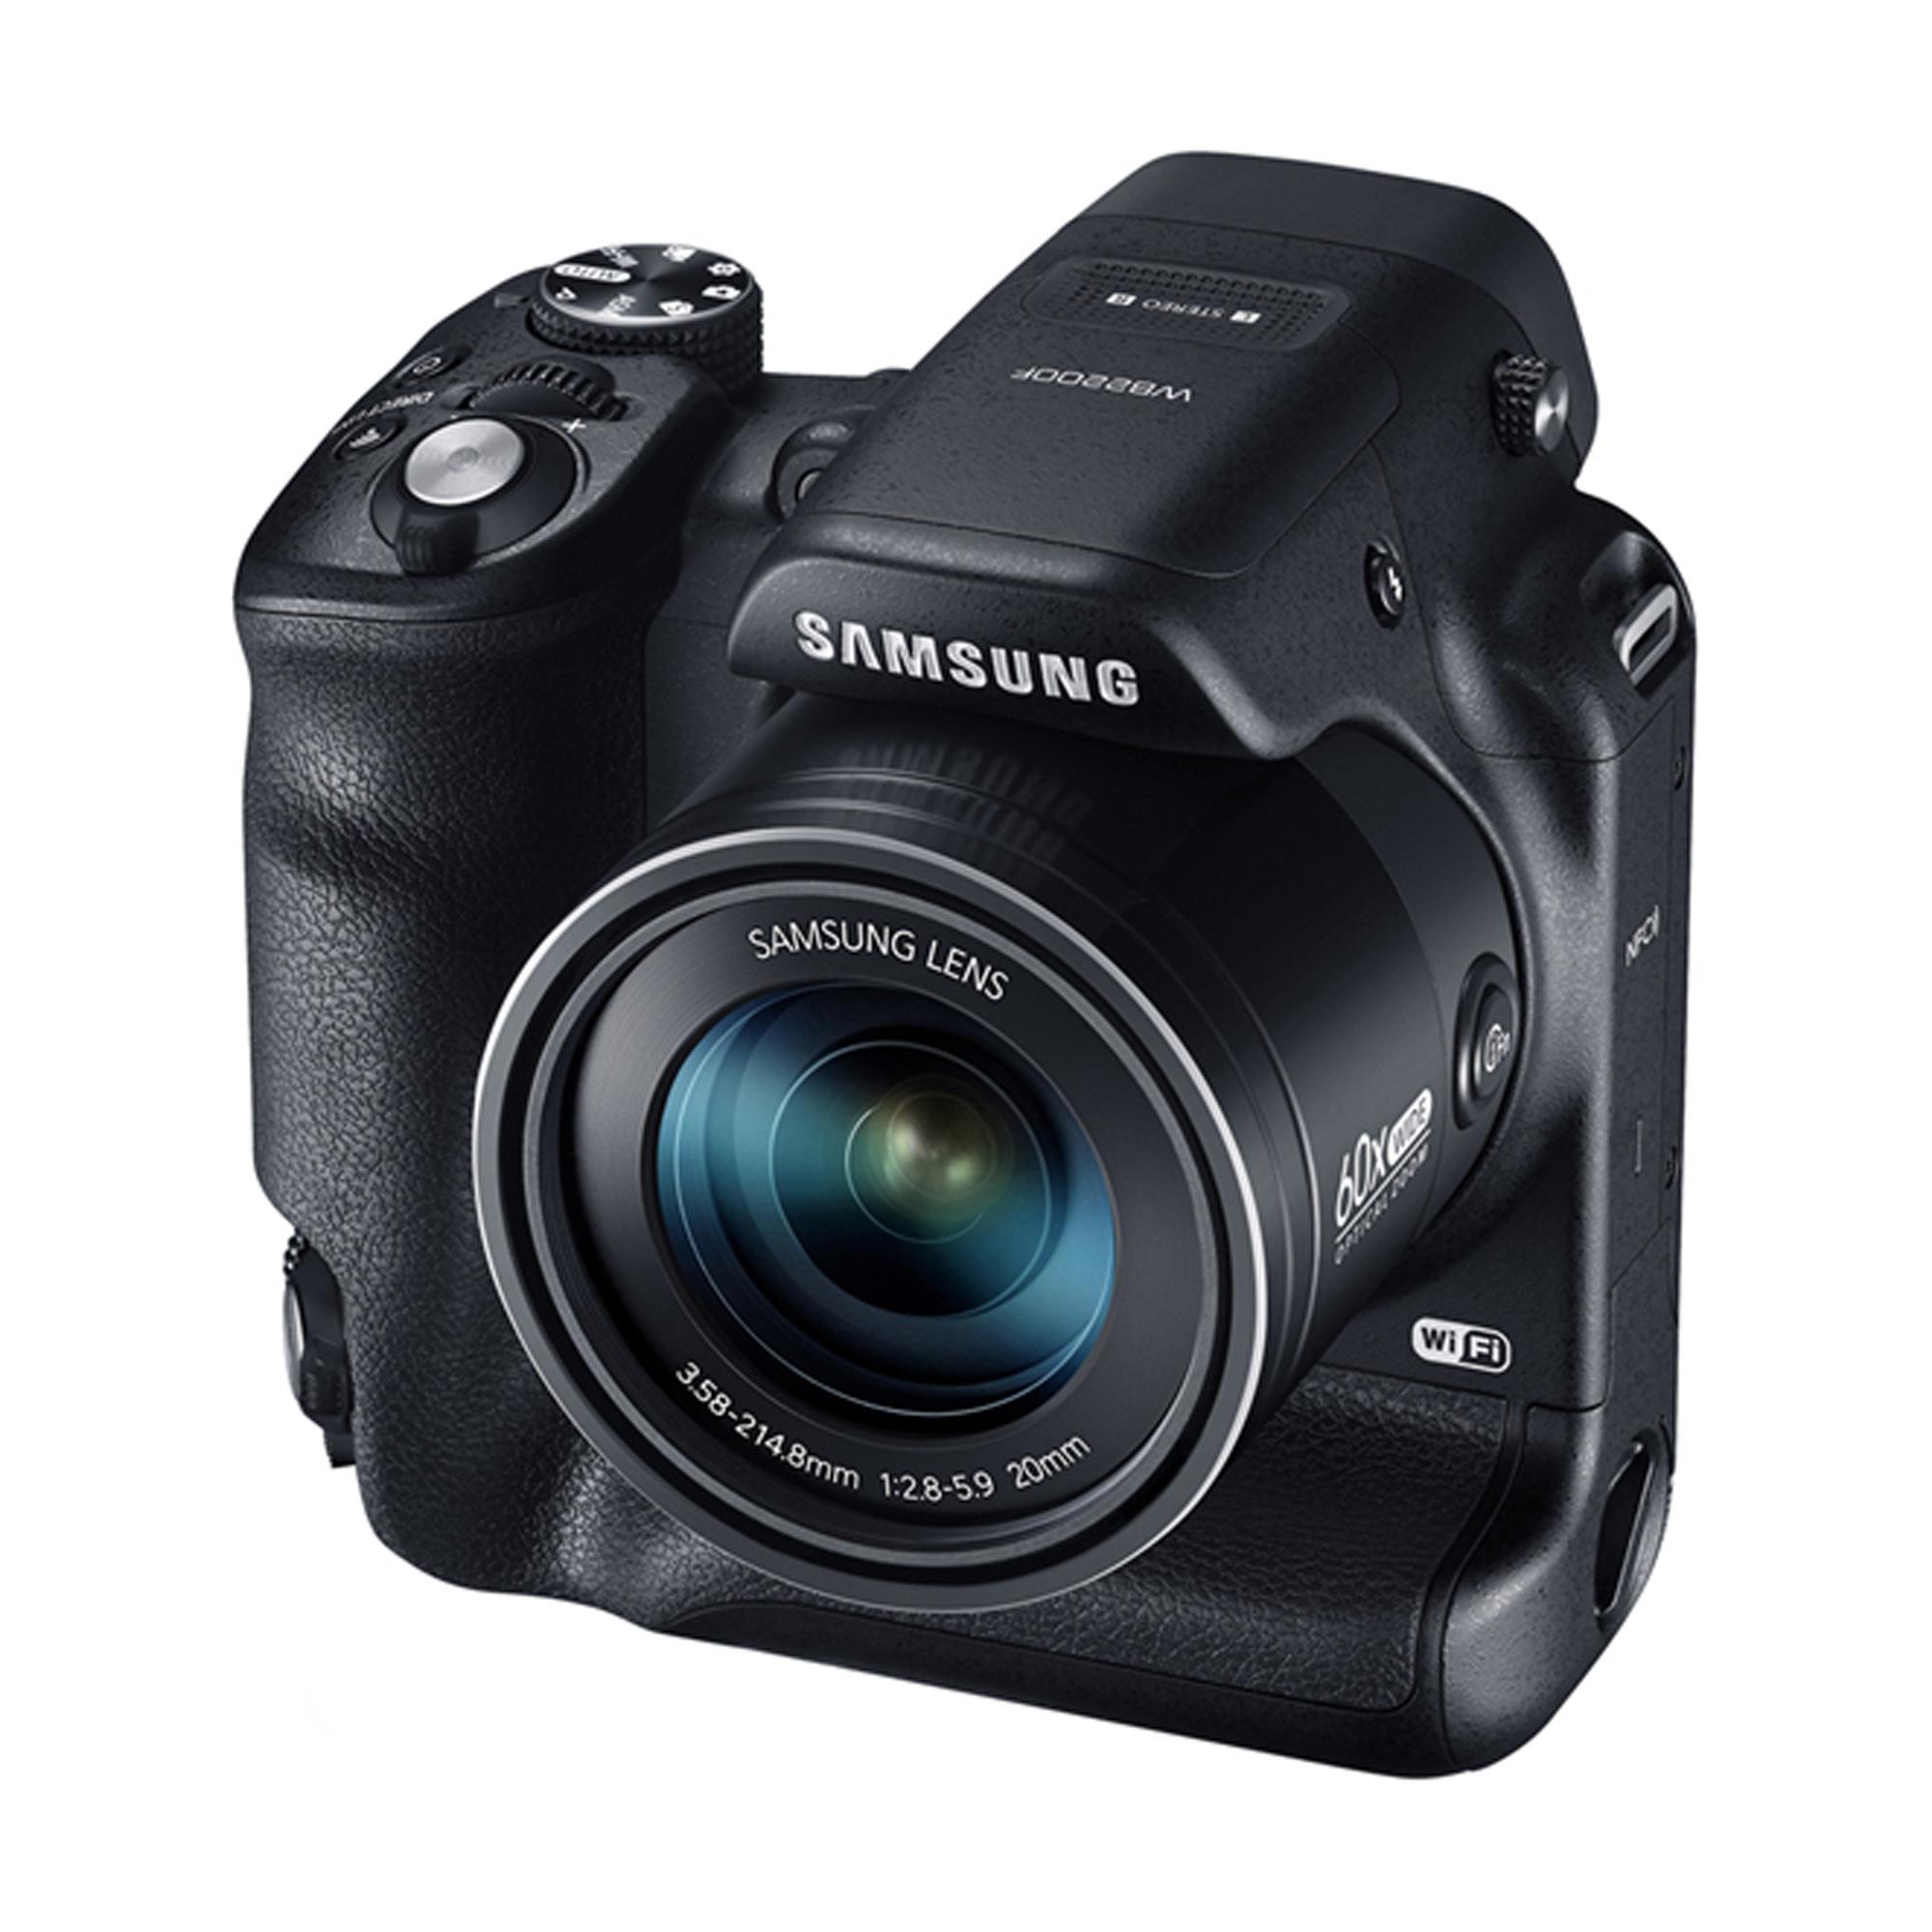 Appareil photo Bridge Samsung WB2200F - 16.4Mp - Optique x60 - Ultra Grand Angle - Wifi / NFC